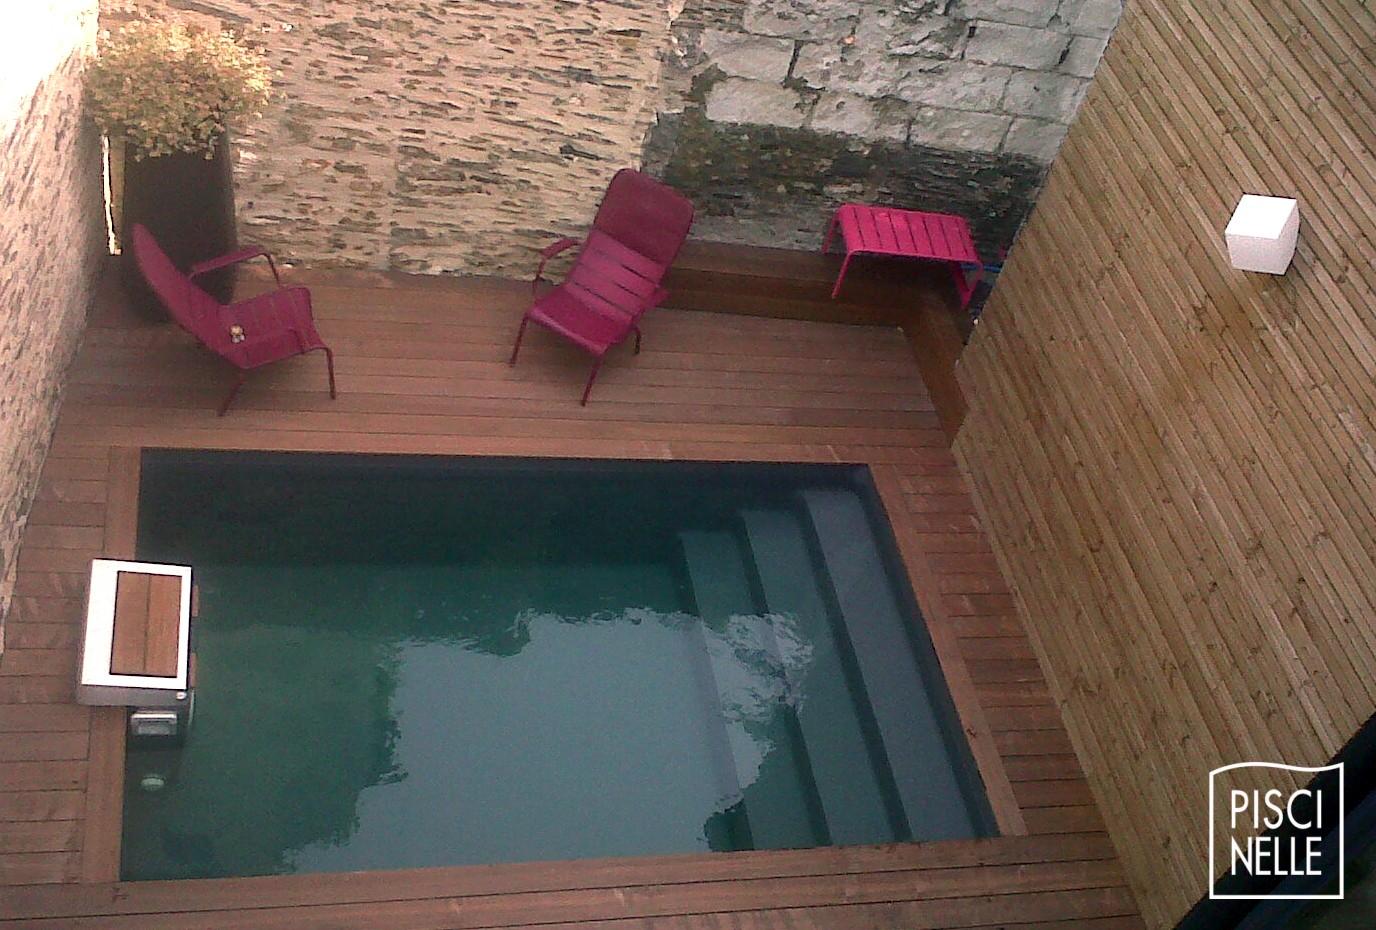 piscine xs mini piscine piscinelle